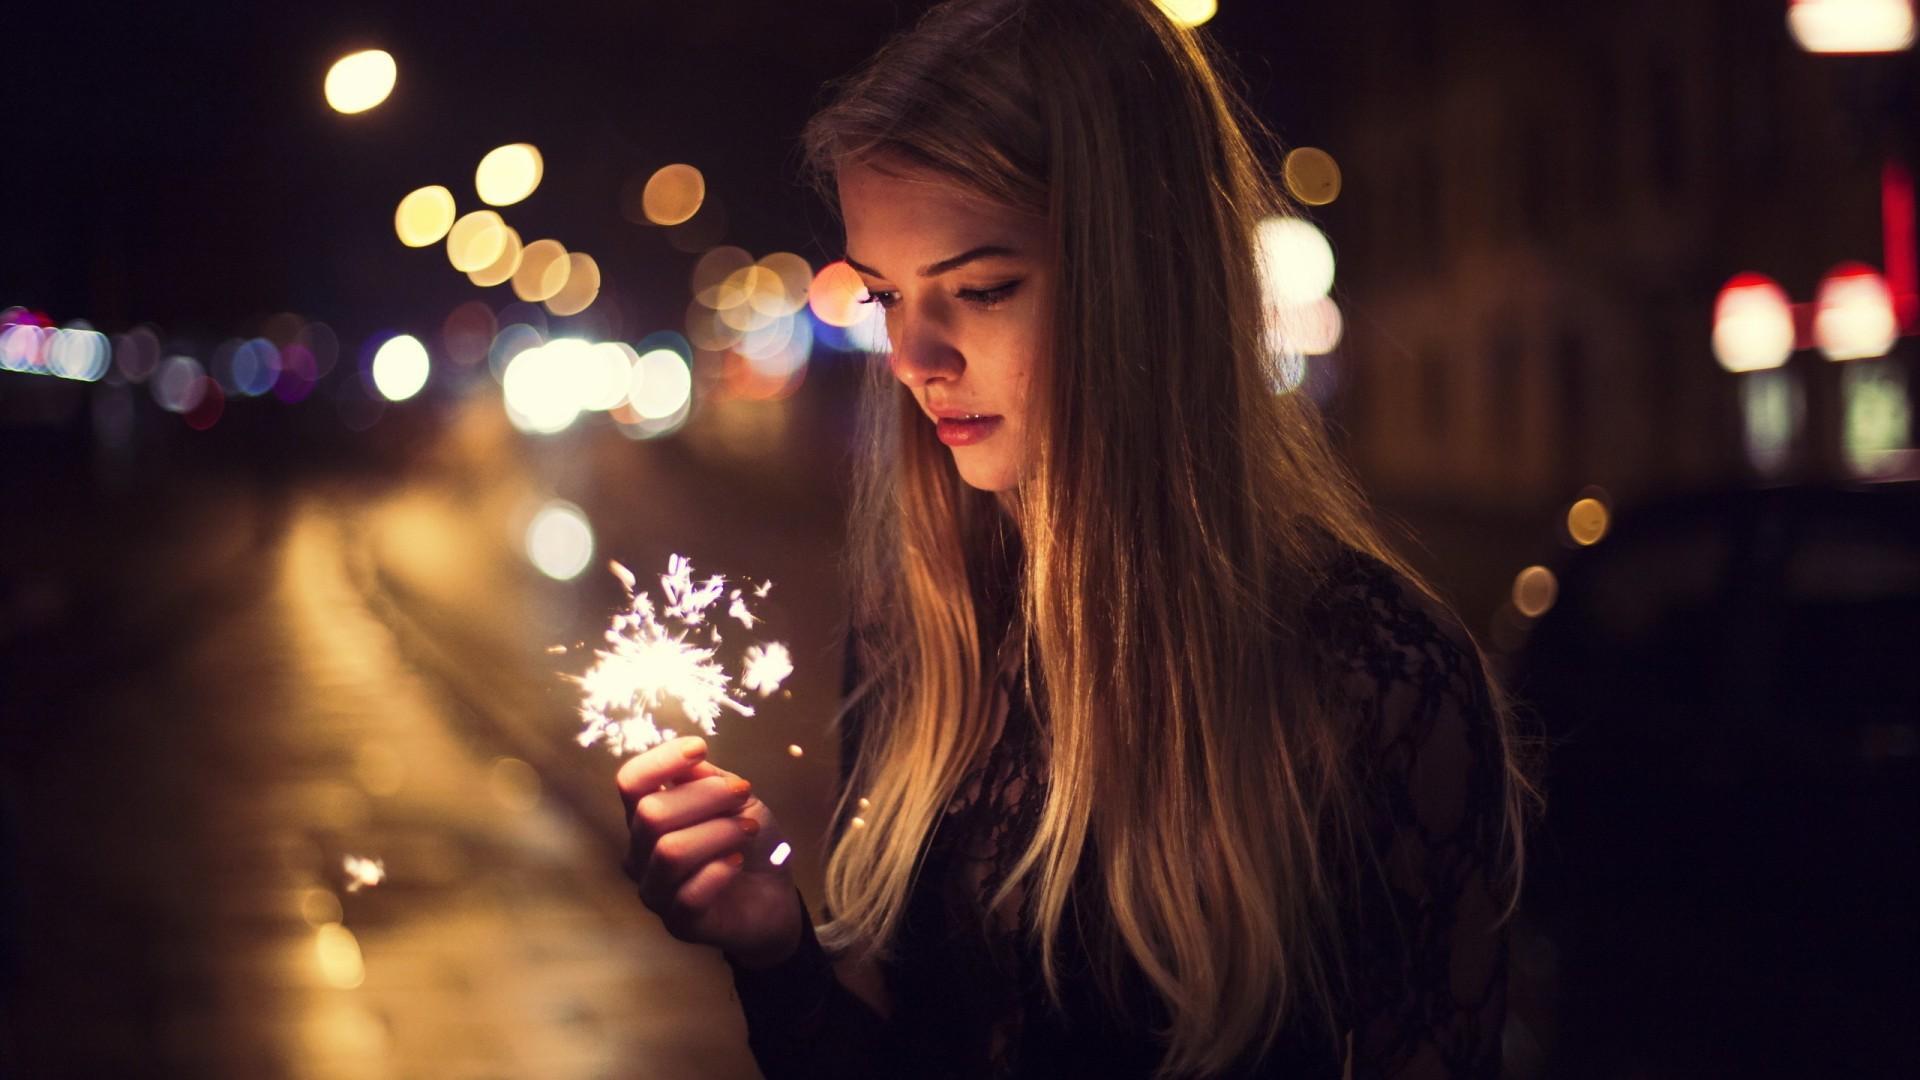 http://www.zastavki.com/pictures/originals/2015/Girls_Girl_holding_a_sparkler_097451_.jpg